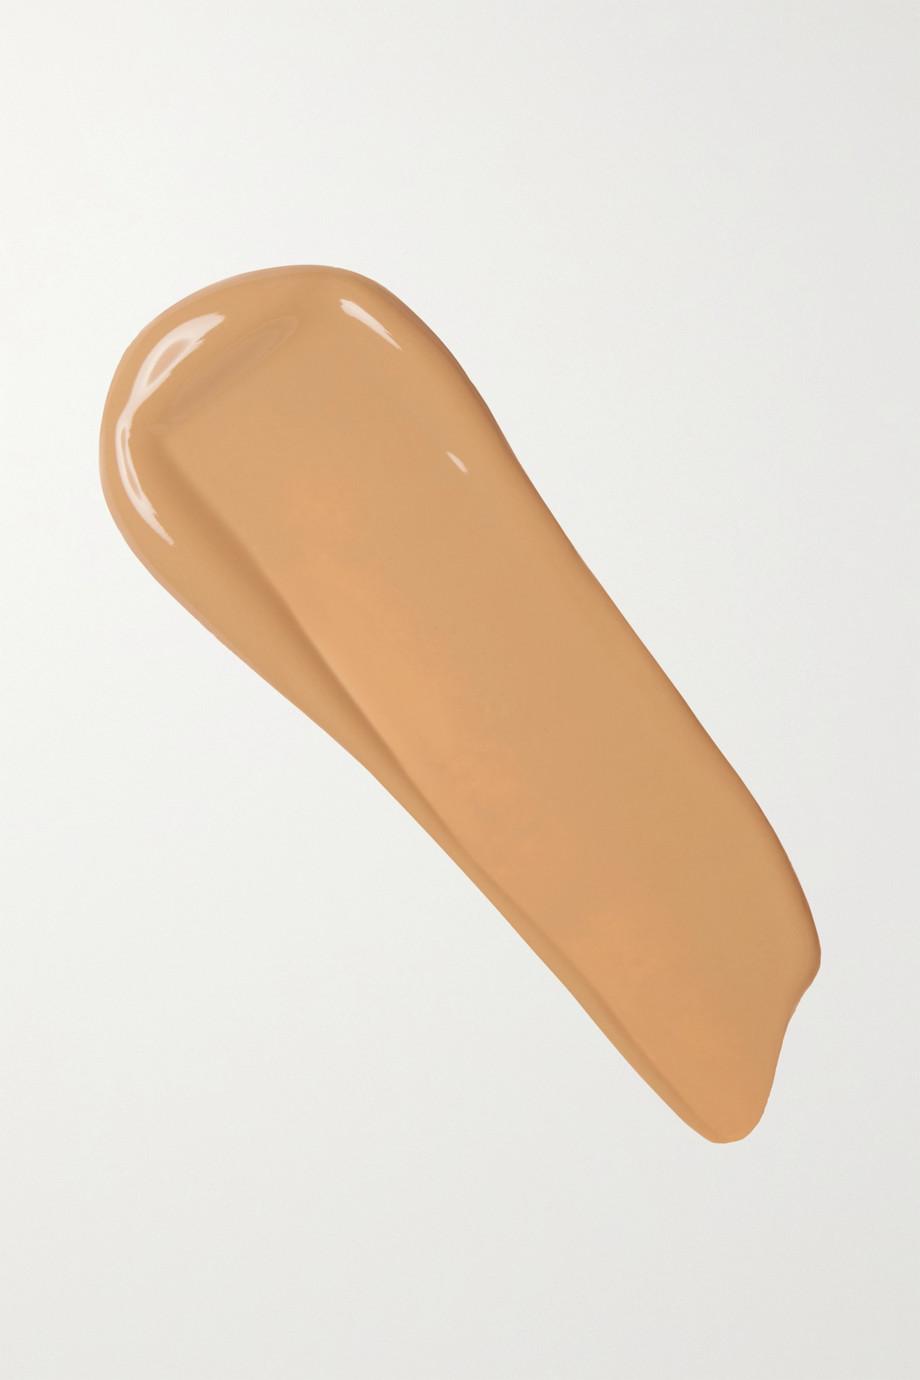 Surratt Beauty Dew Drop Foundation – 8, 19 ml